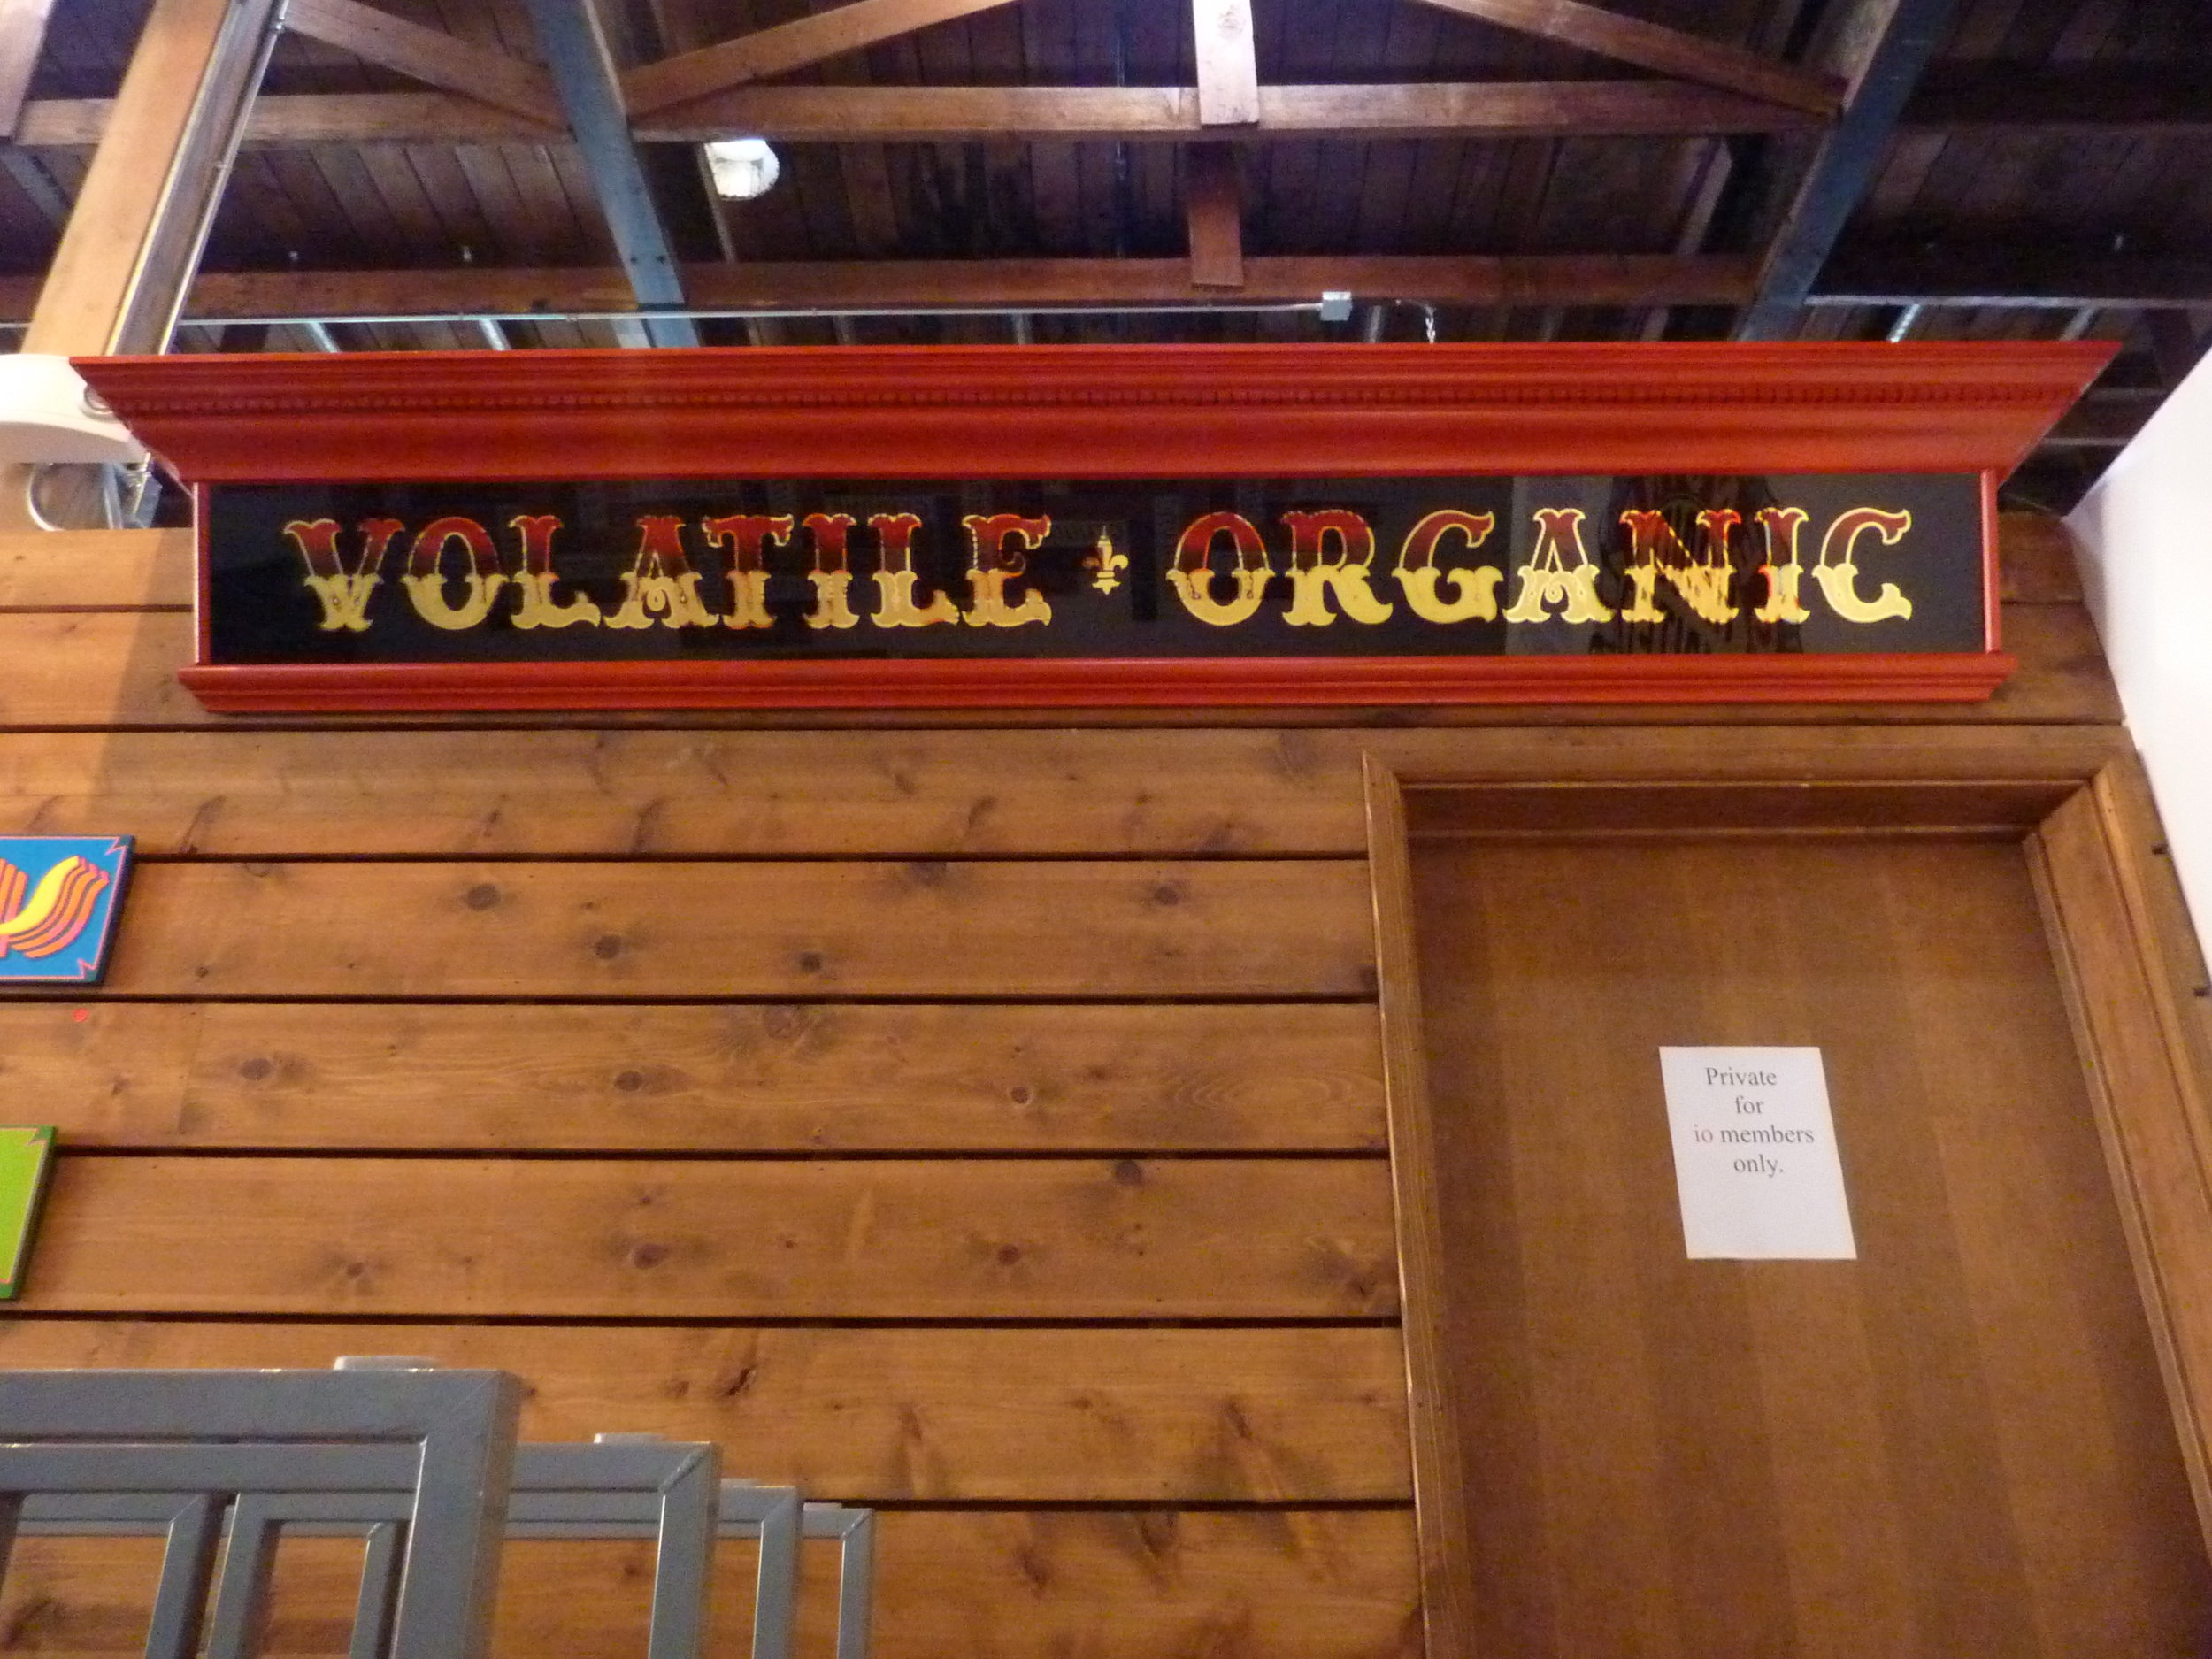 ORIG-volatile-organic_8762751790_o.jpg